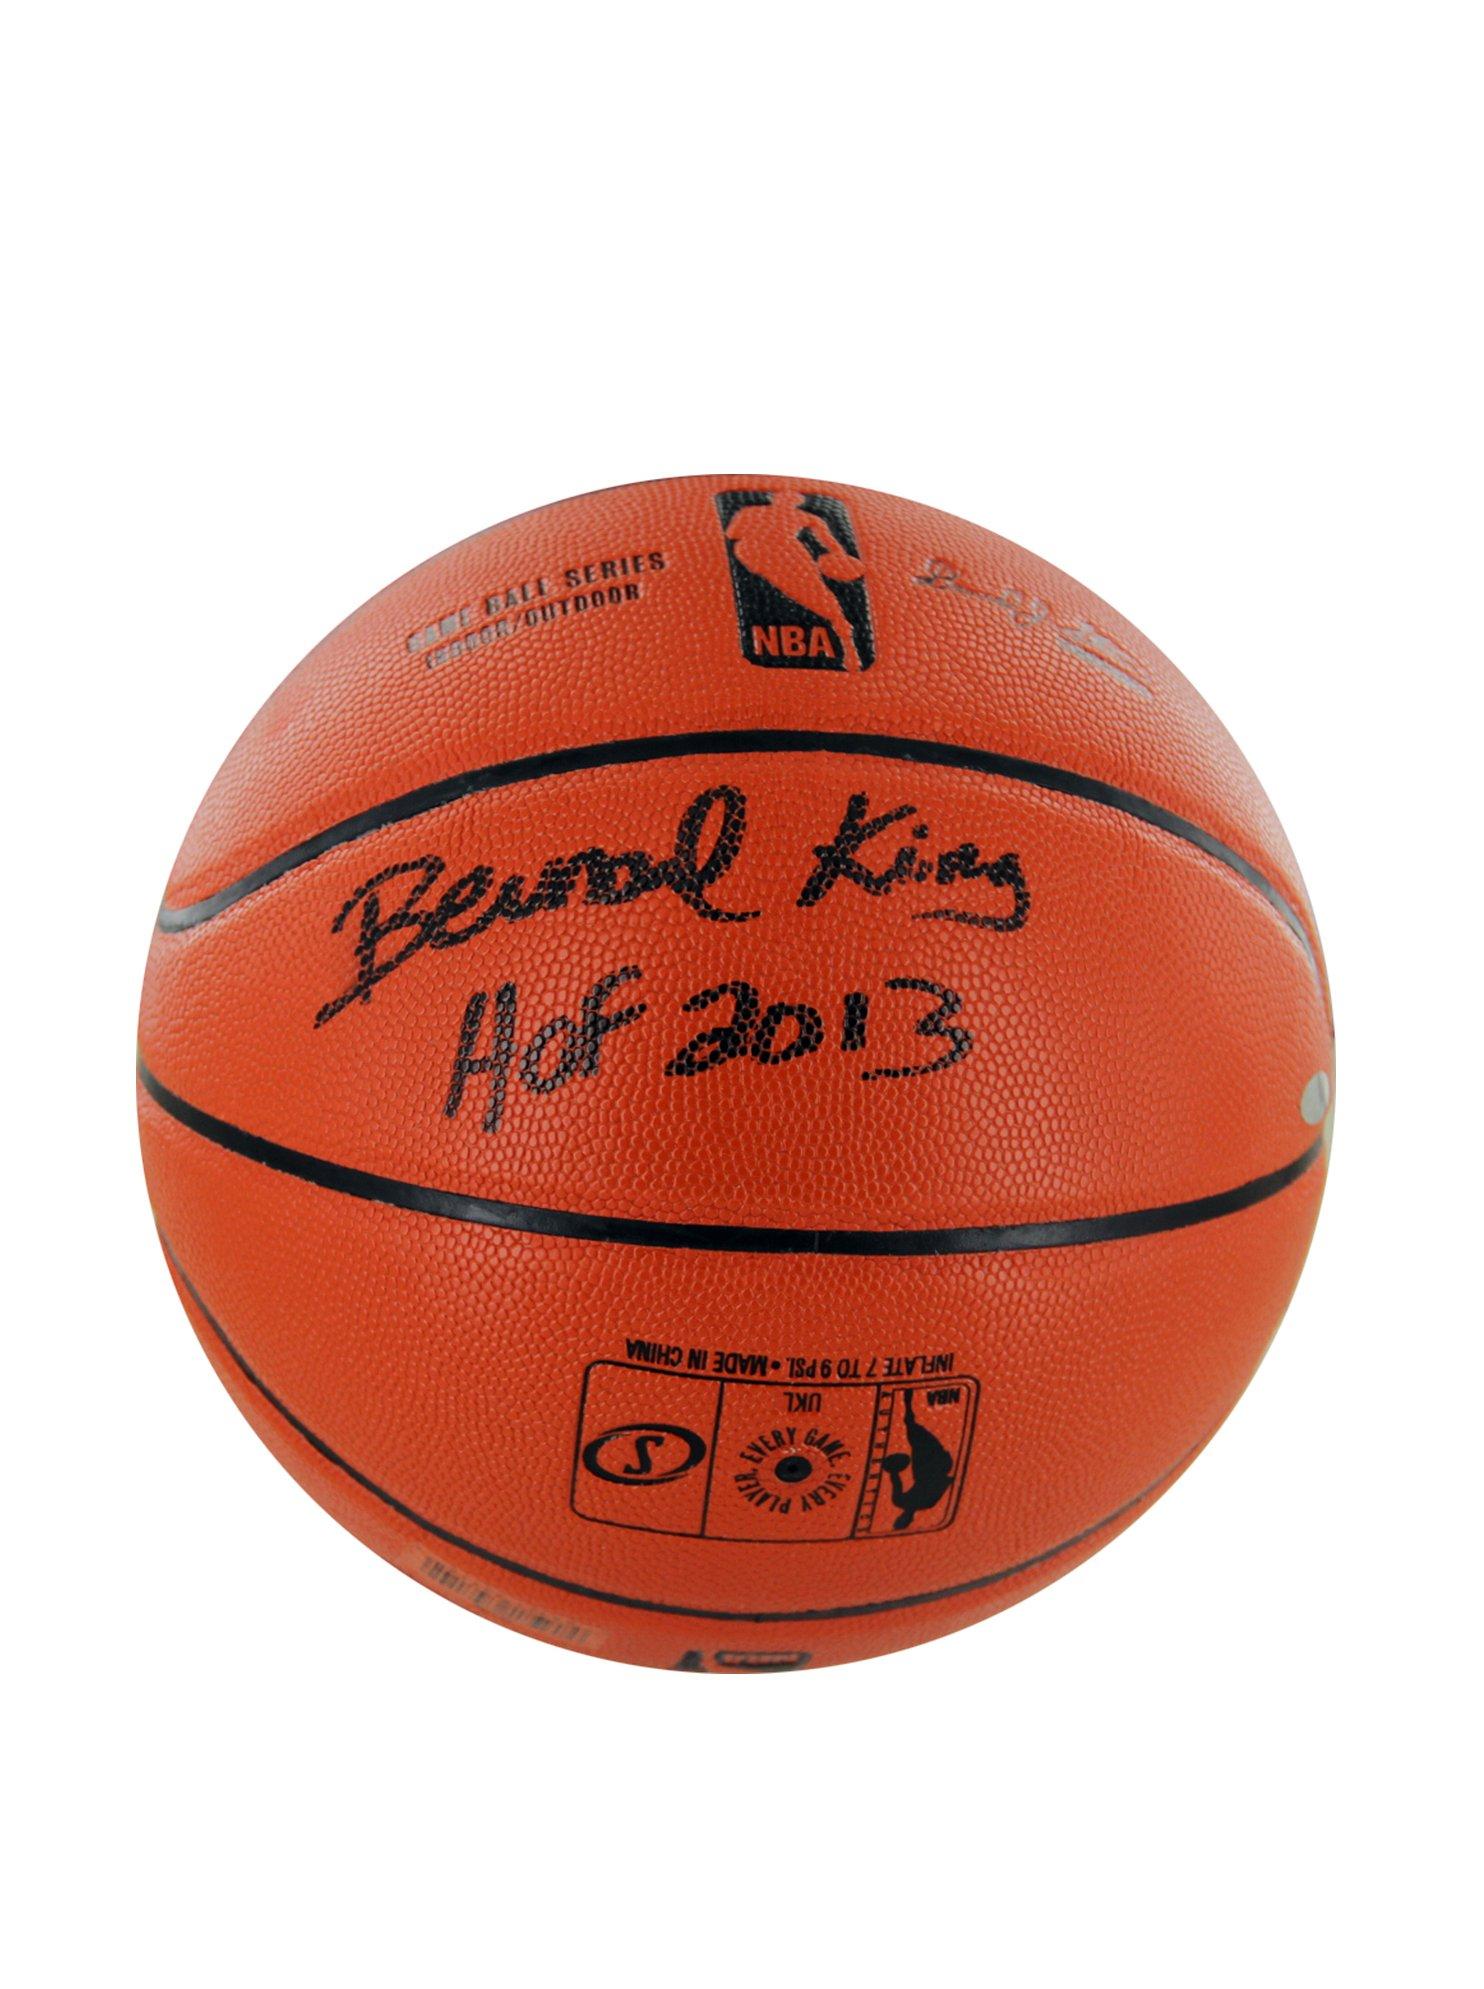 NBA New York Knicks Bernard King Signed I/O Basketball with ''HOF'' Inscription